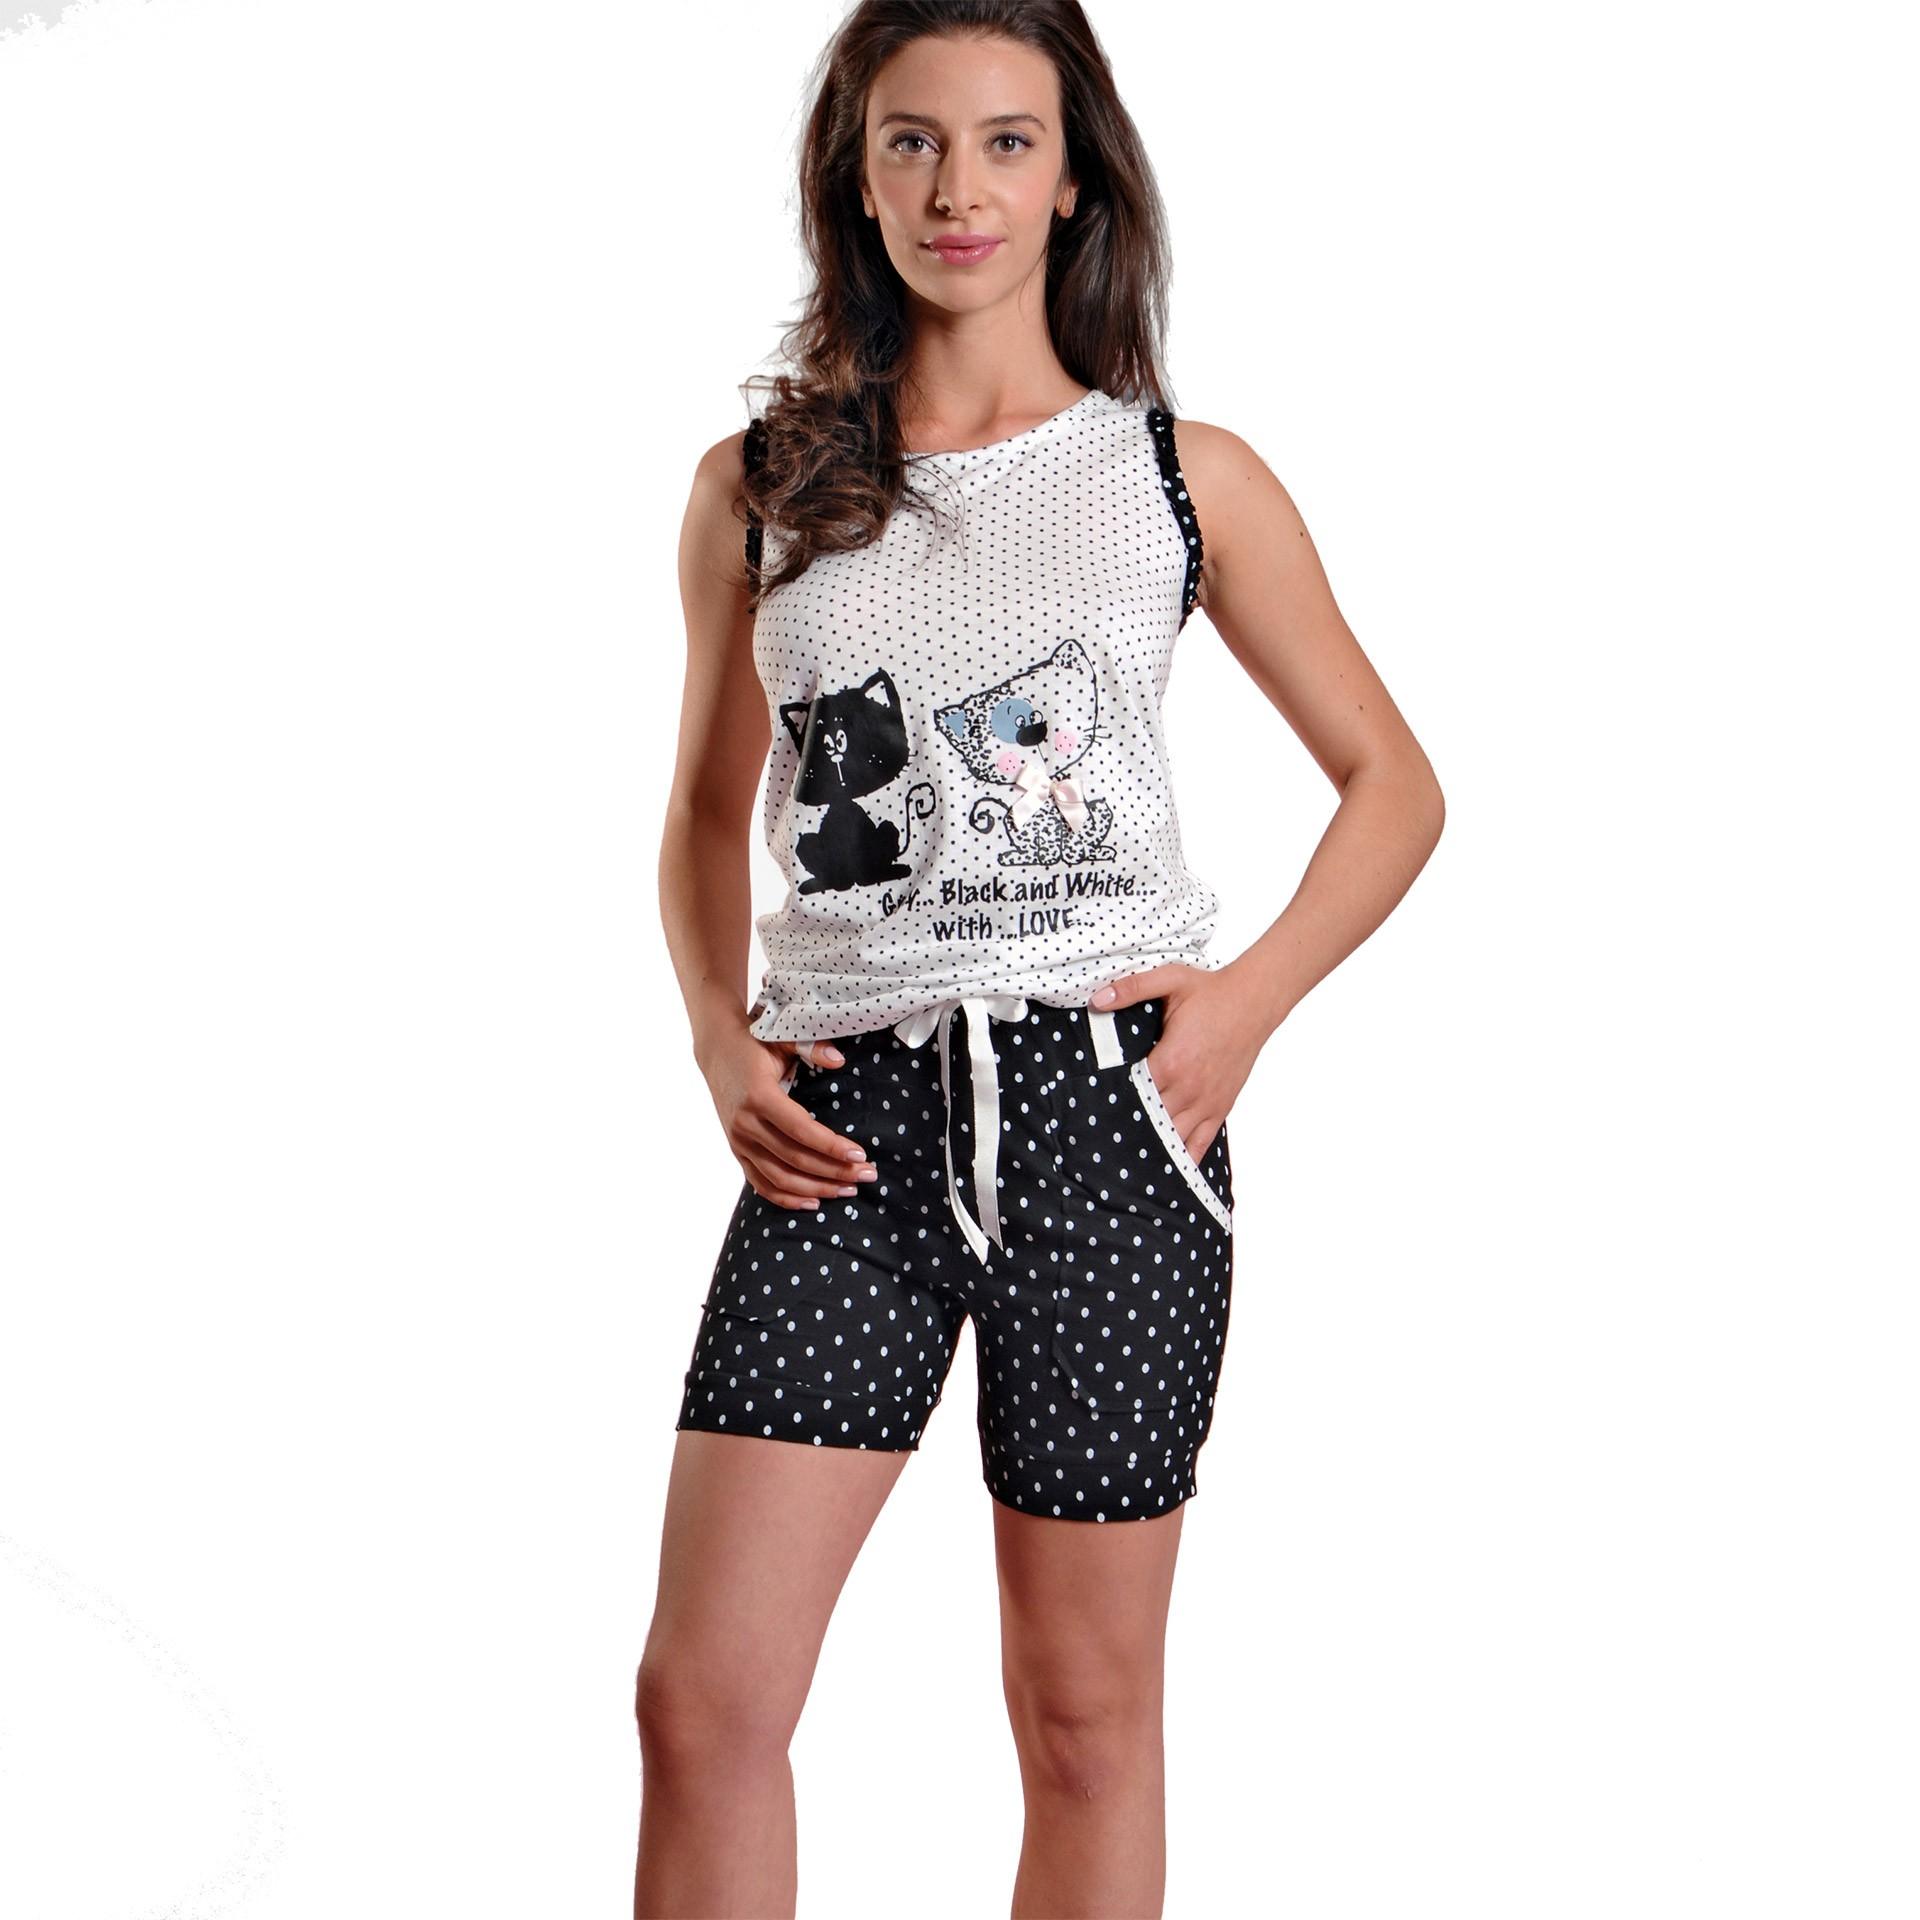 47350247ba2 Ogham γυναικεία καλοκαιρινή πυτζάμα άσπρη πουά αμάνικη μπλούζα με ...